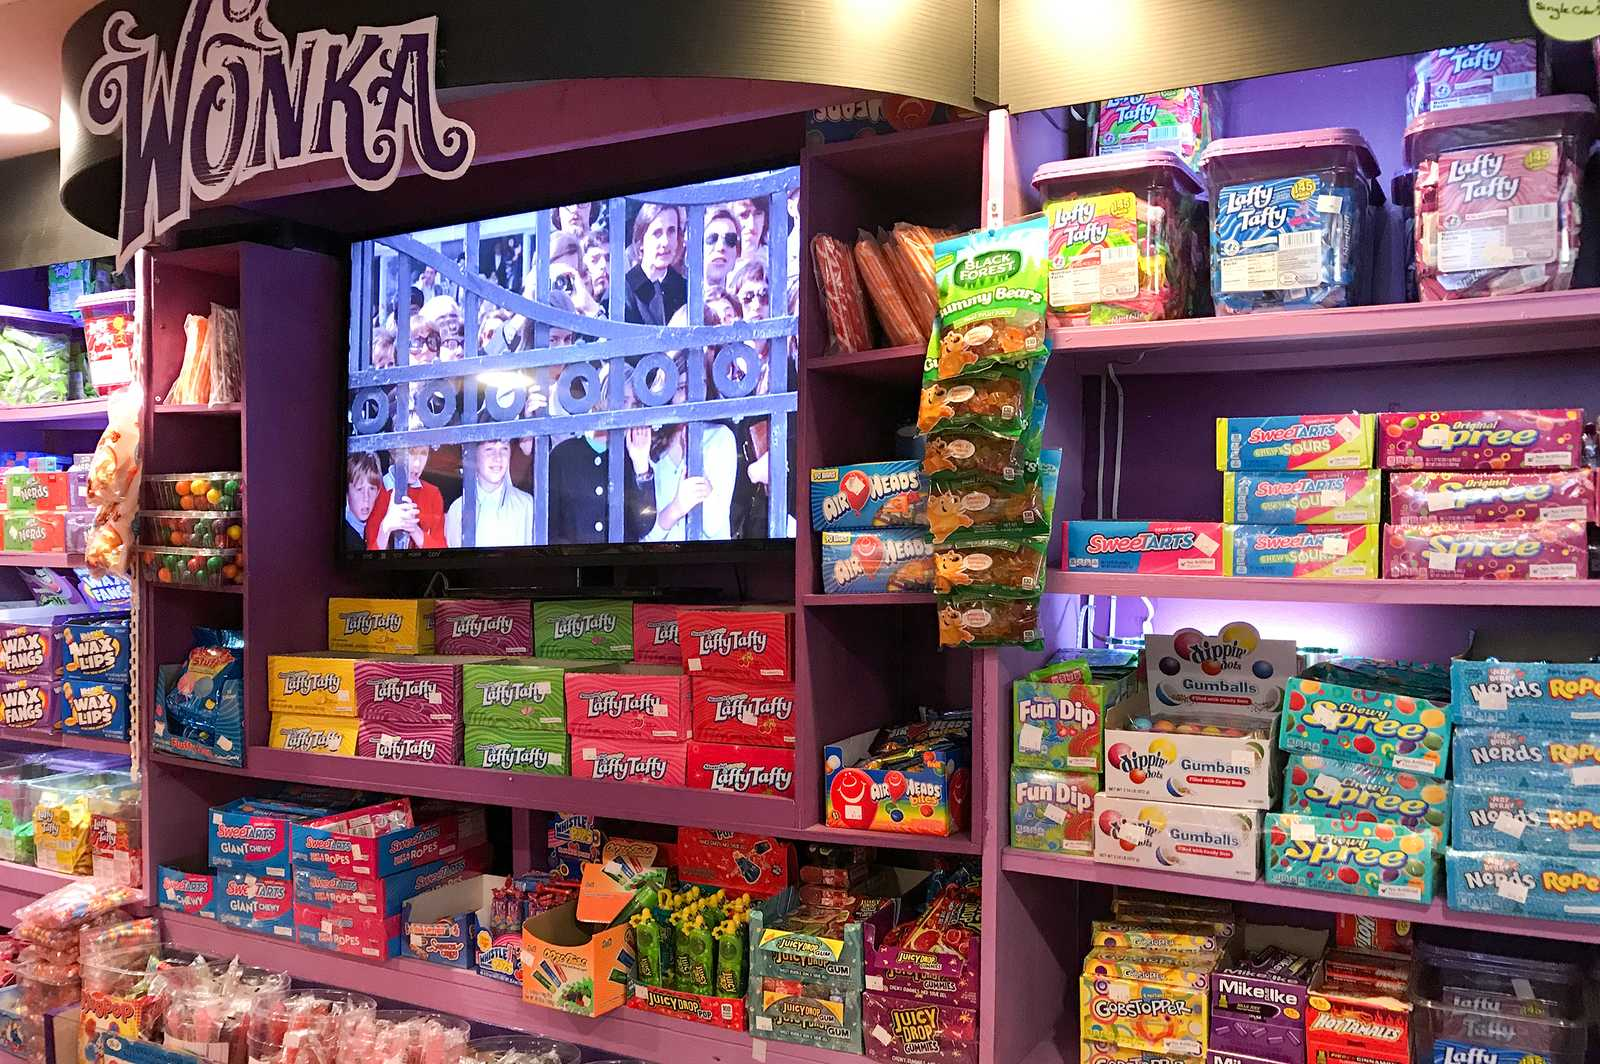 Wonka-Regal im Grandpa Joe's Candy Shop in Pittsburgh